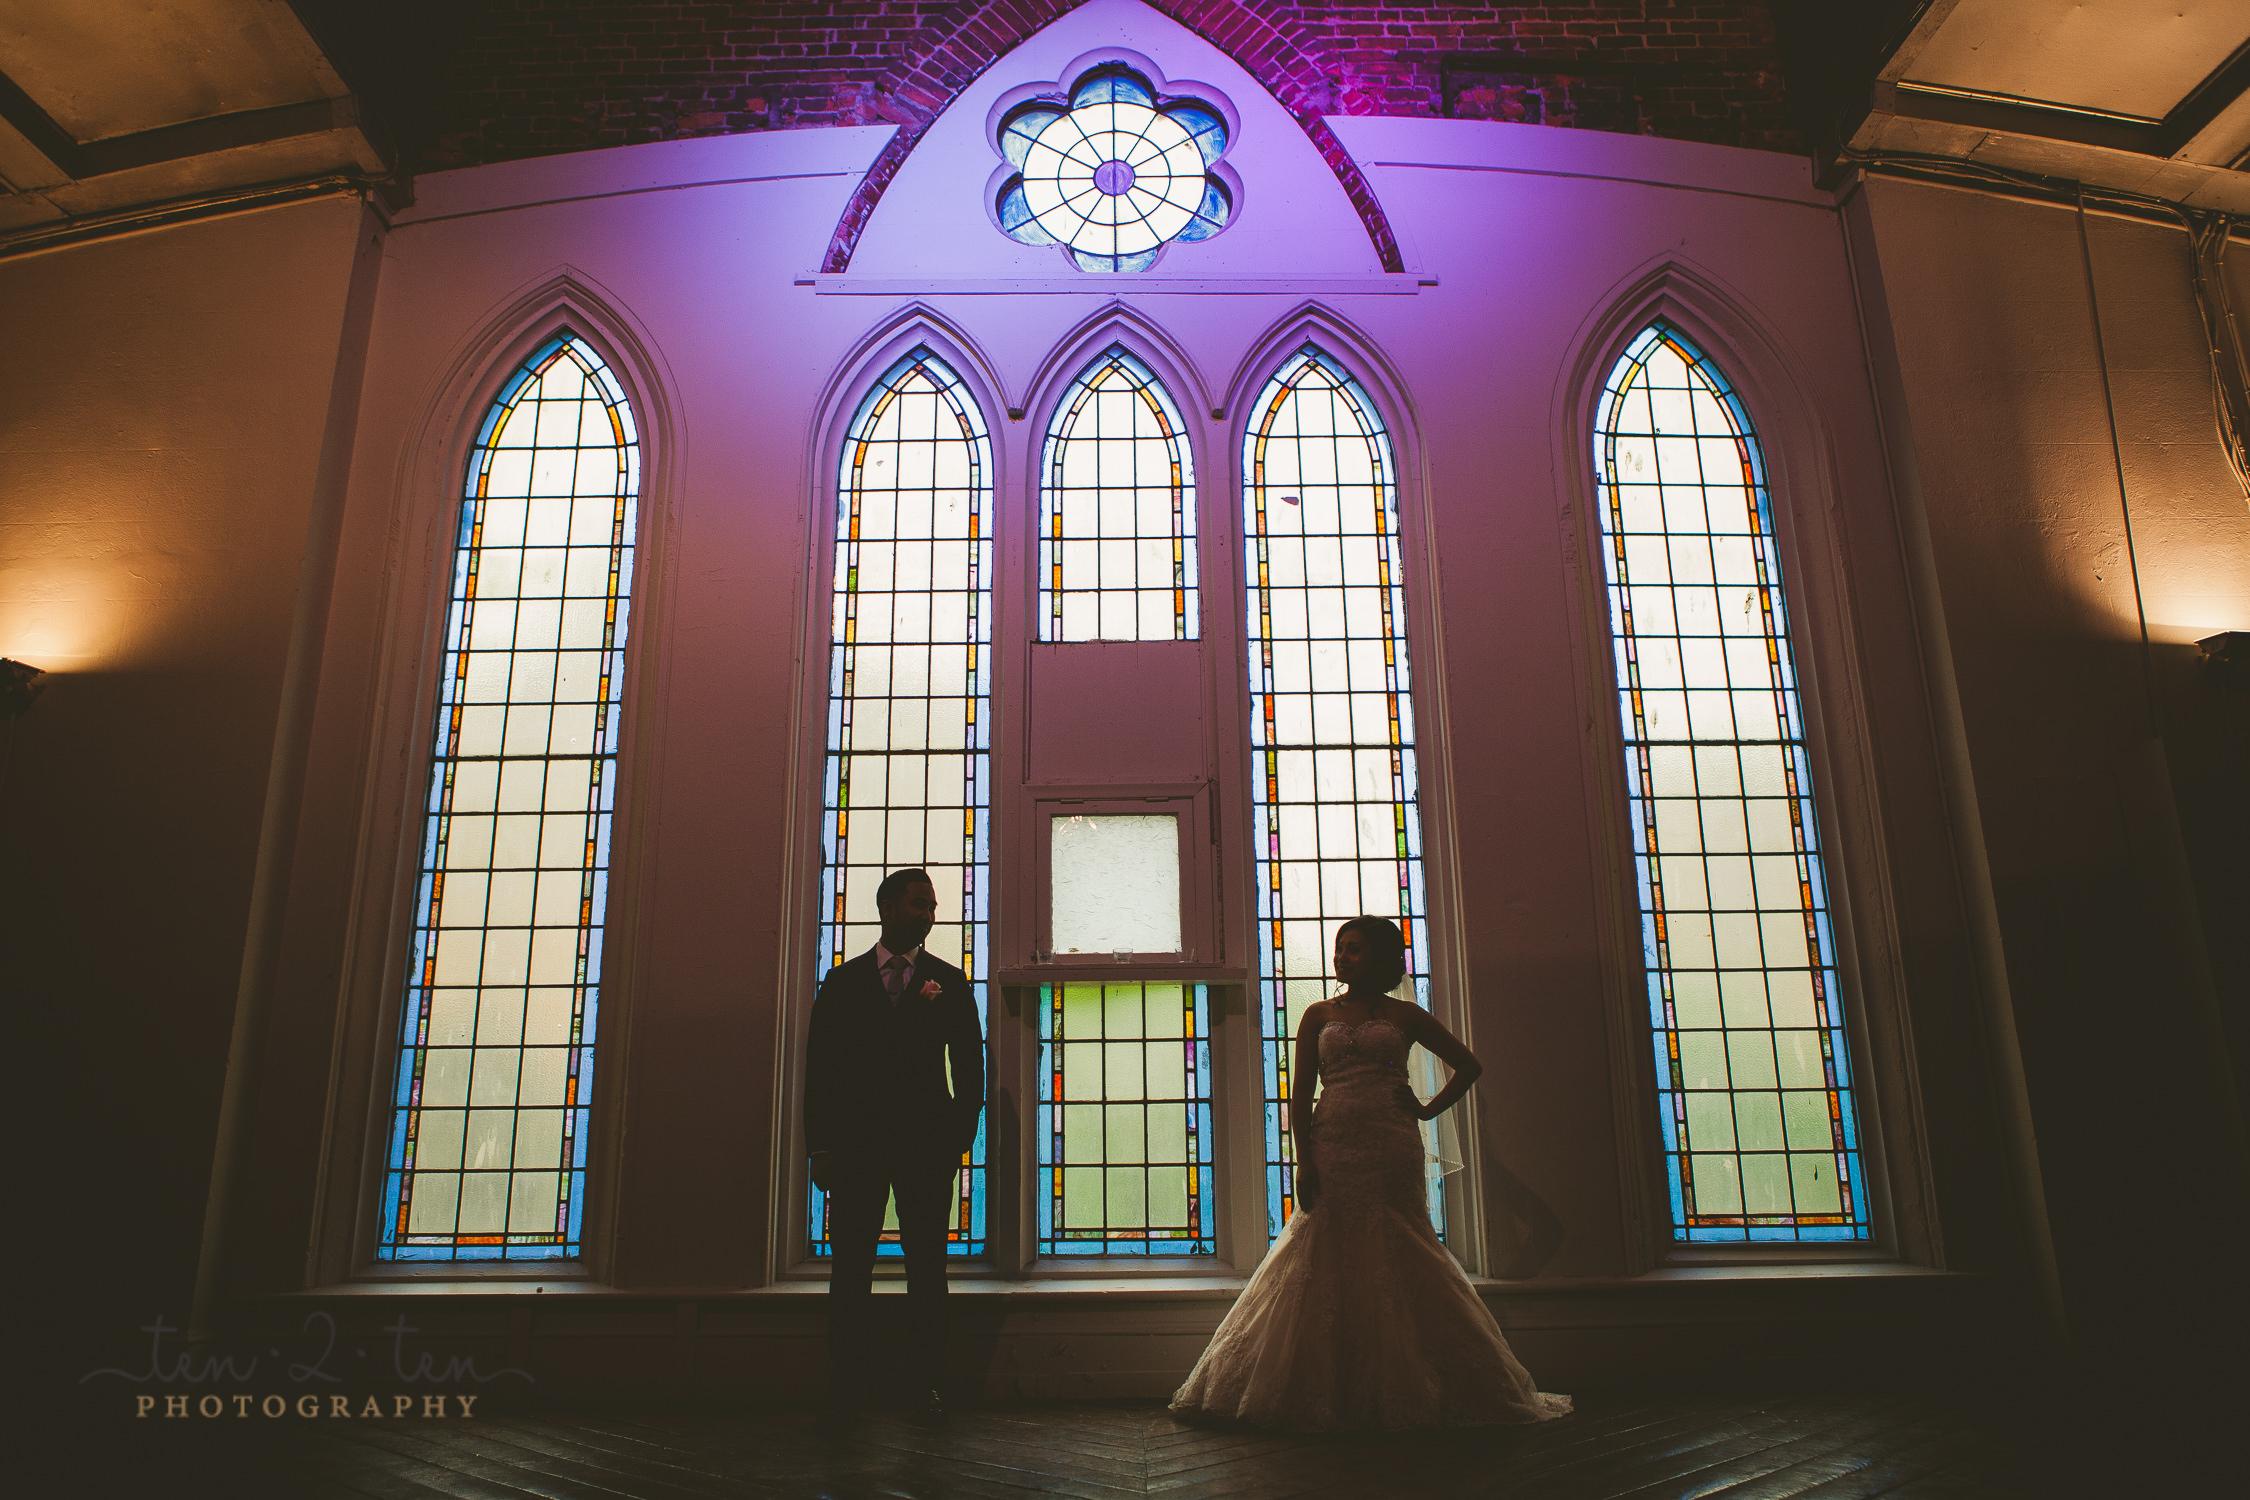 berkeley church wedding, berkeley church wedding photos, berkeley church wedding photography, wedding photos berkeley church, indoor wedding photography locations in Toronto